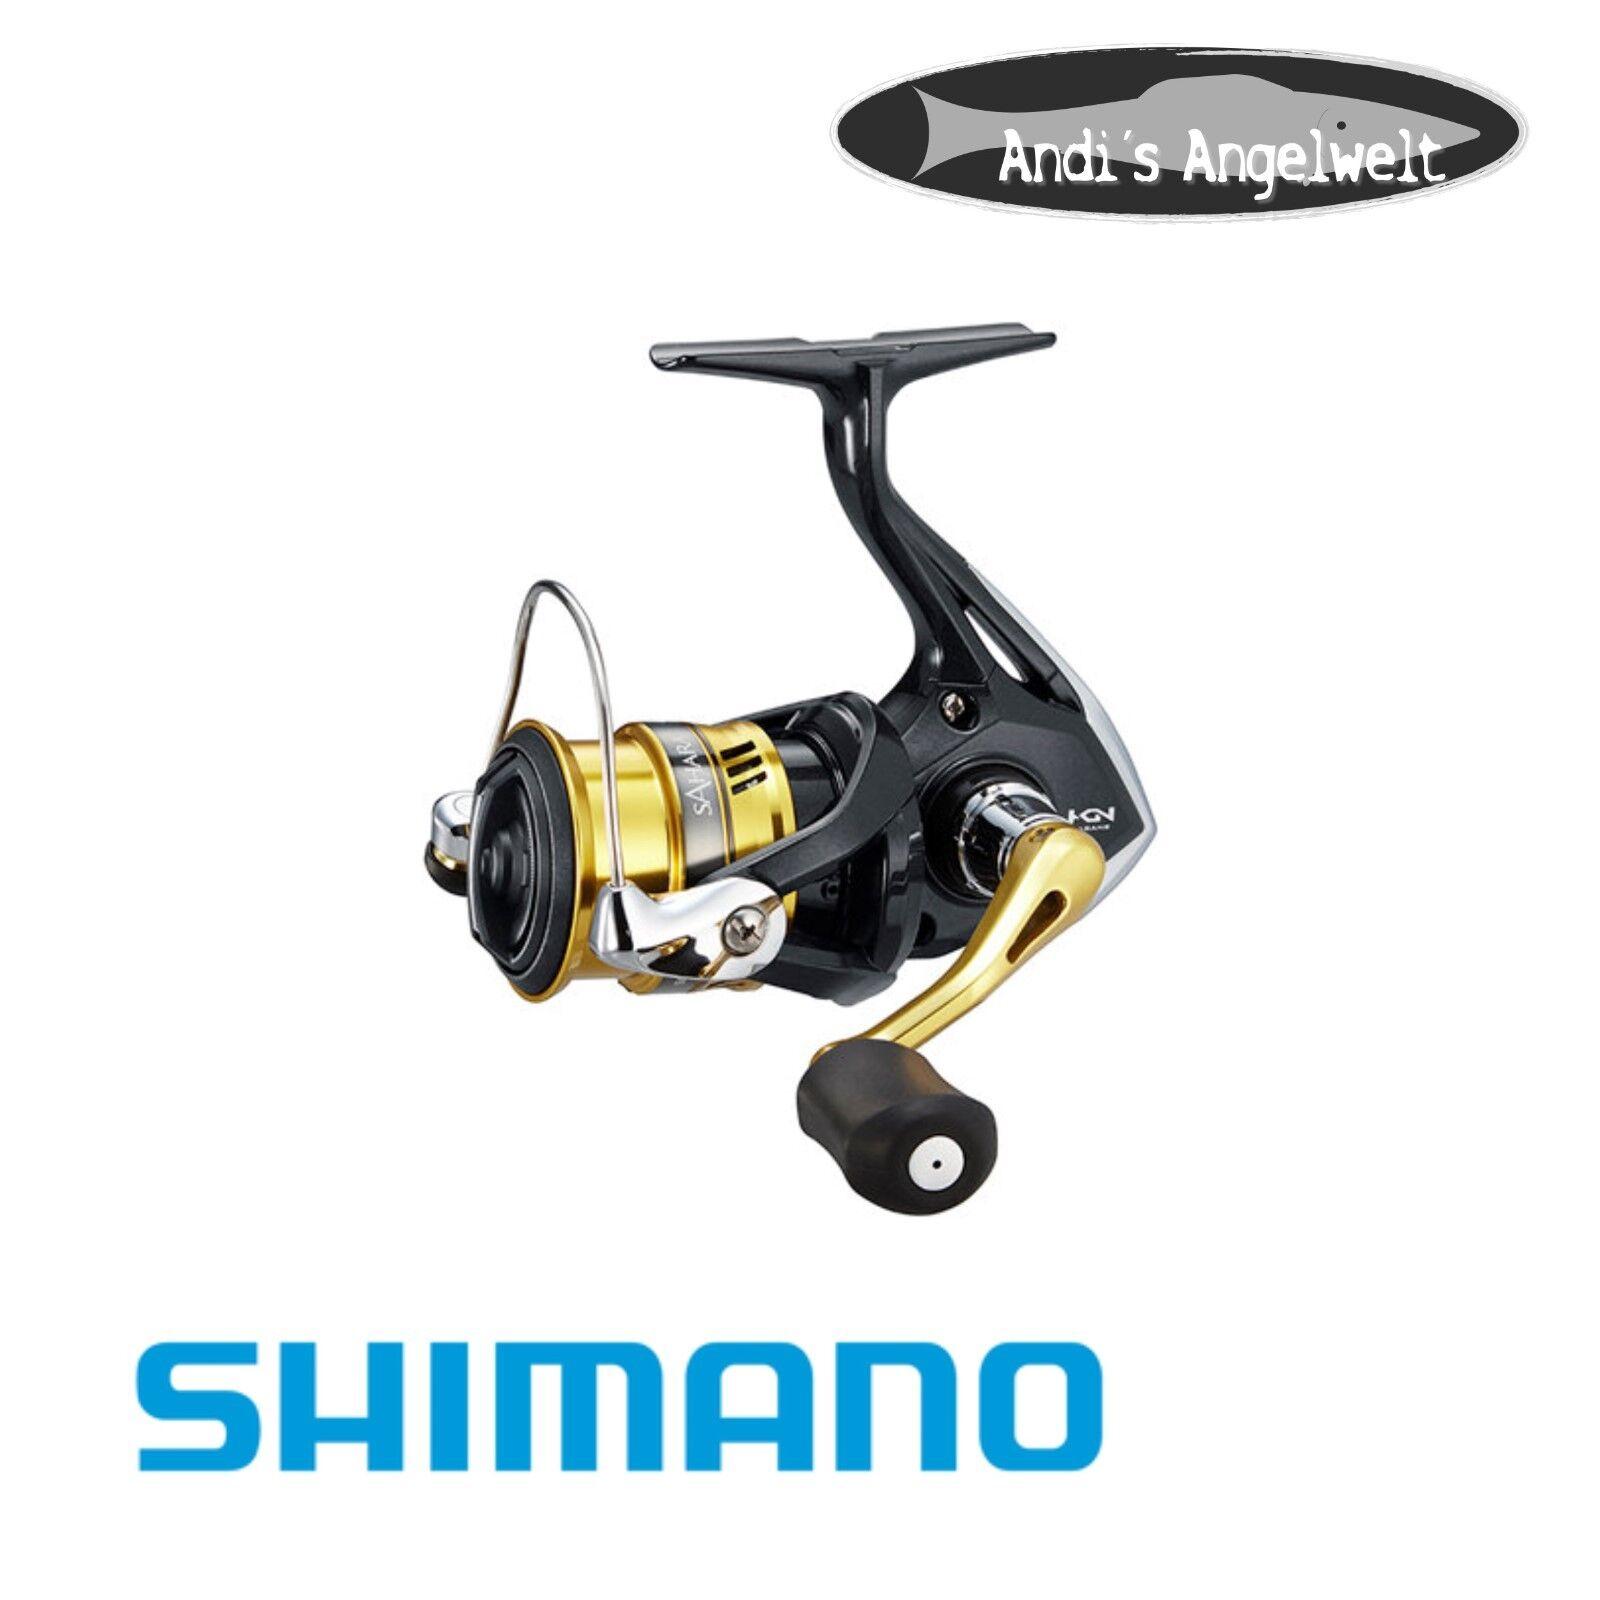 Shimano Sahara FI- alle Größen - Neuheit 2018 - Angelrolle